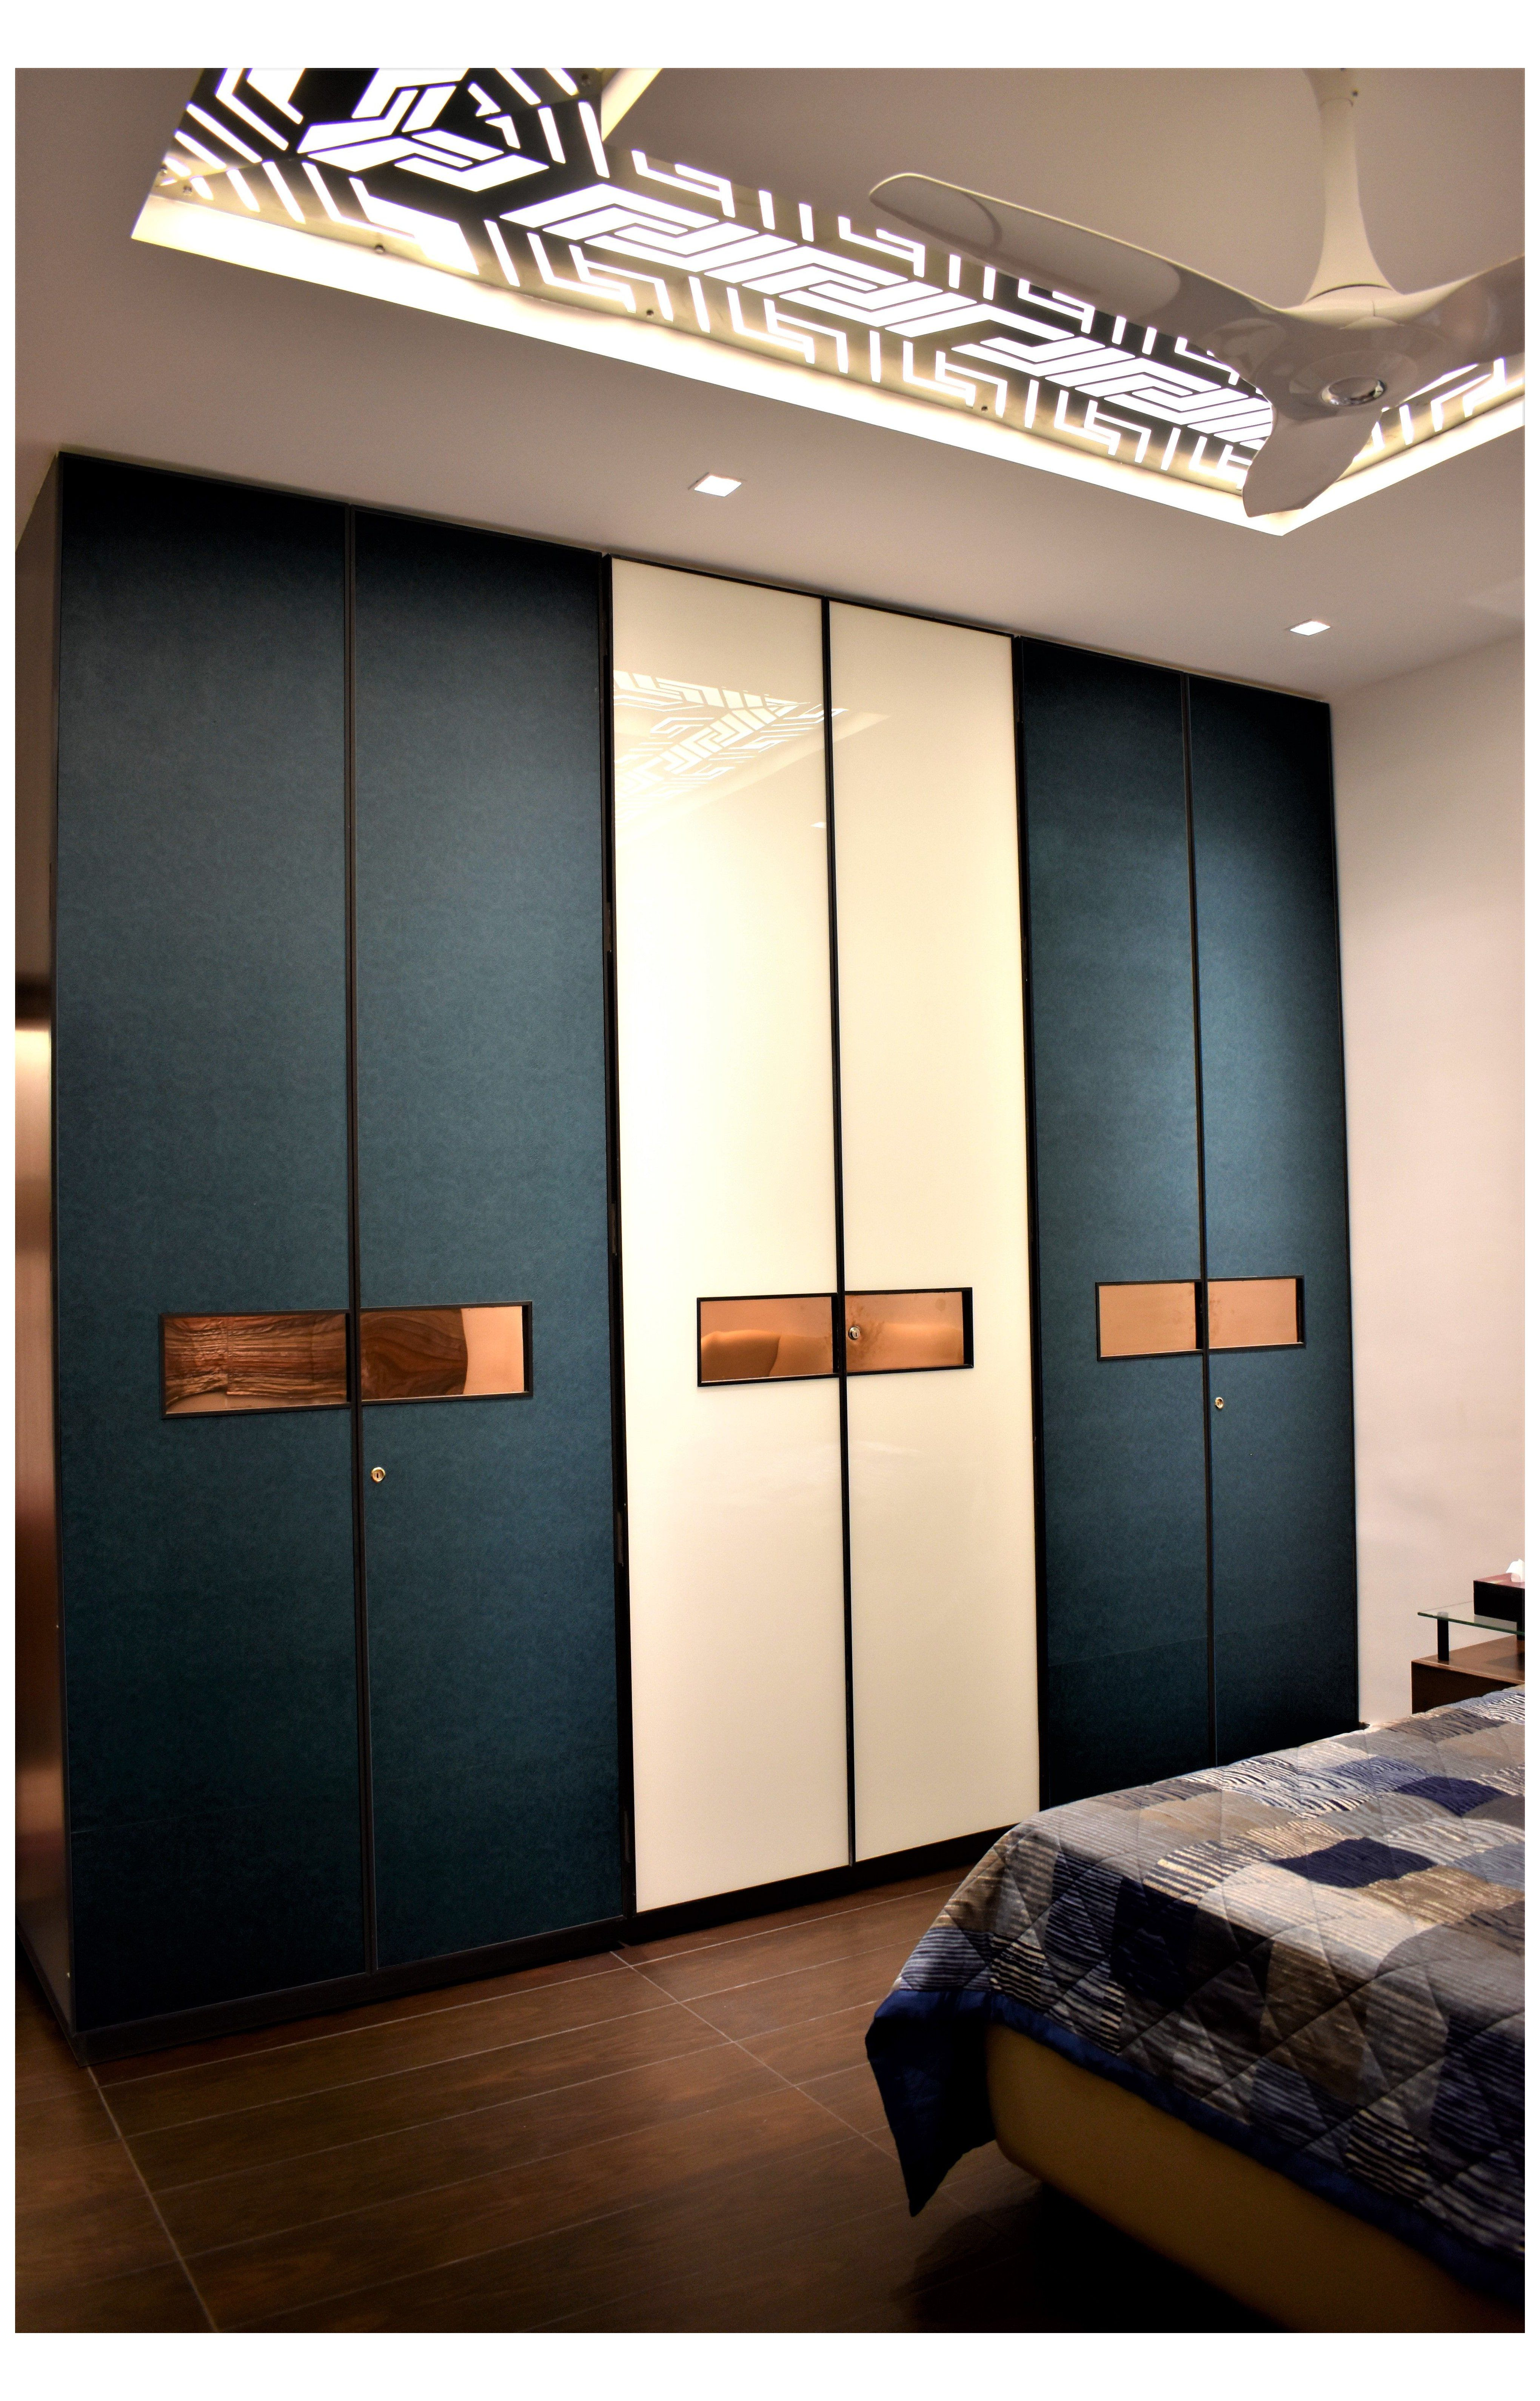 Master Bedroom Wardrobe Door Designs Laminate Wardrobedoordesignslaminate In 2021 Wardrobe Design Bedroom Wardrobe Door Designs Modern Cupboard Design